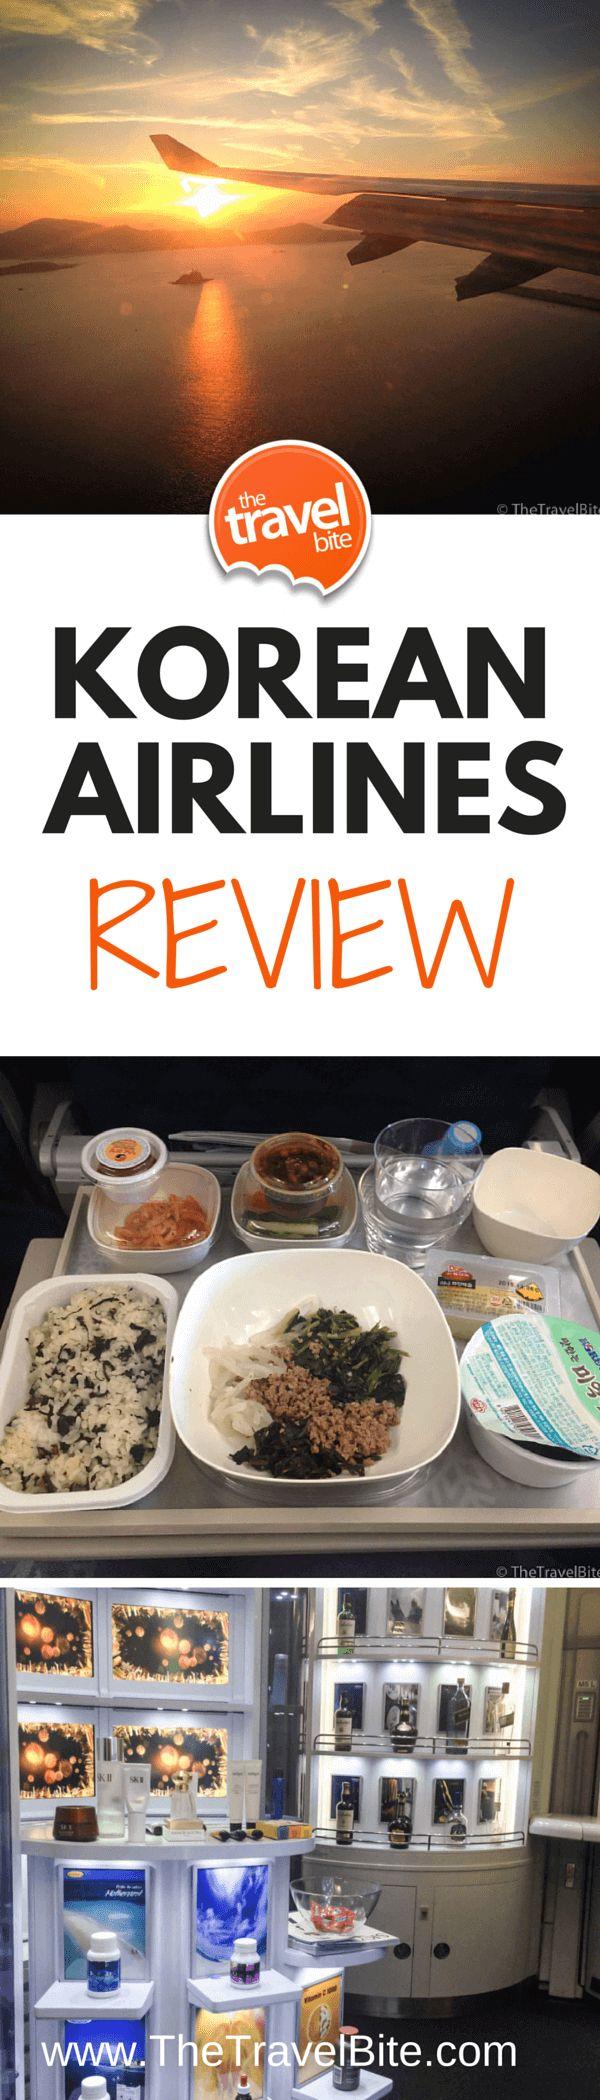 Korean Airlines Review